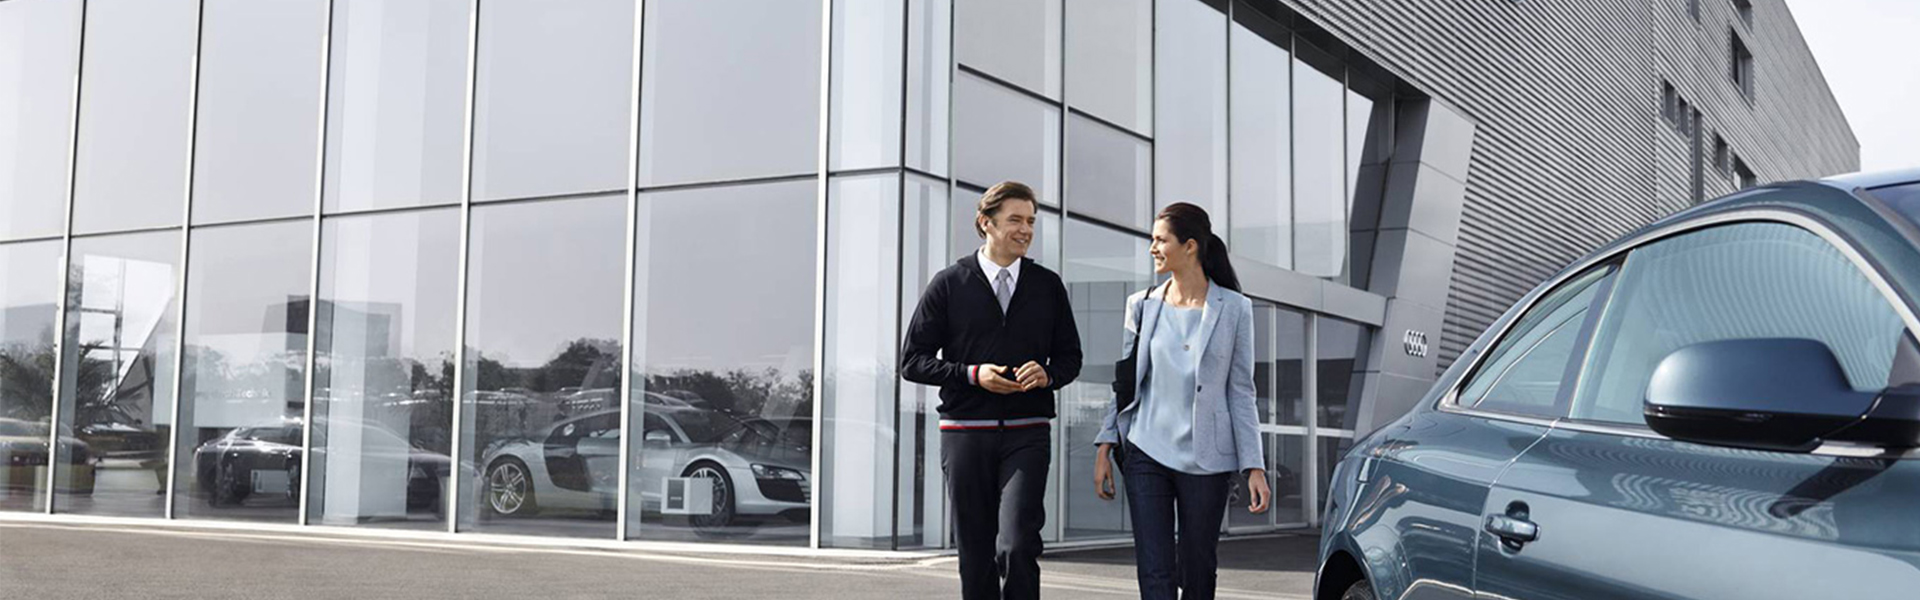 Merkamotor Tortosa, Concesionario Oficial Audi en Tortosa (Tarragona)